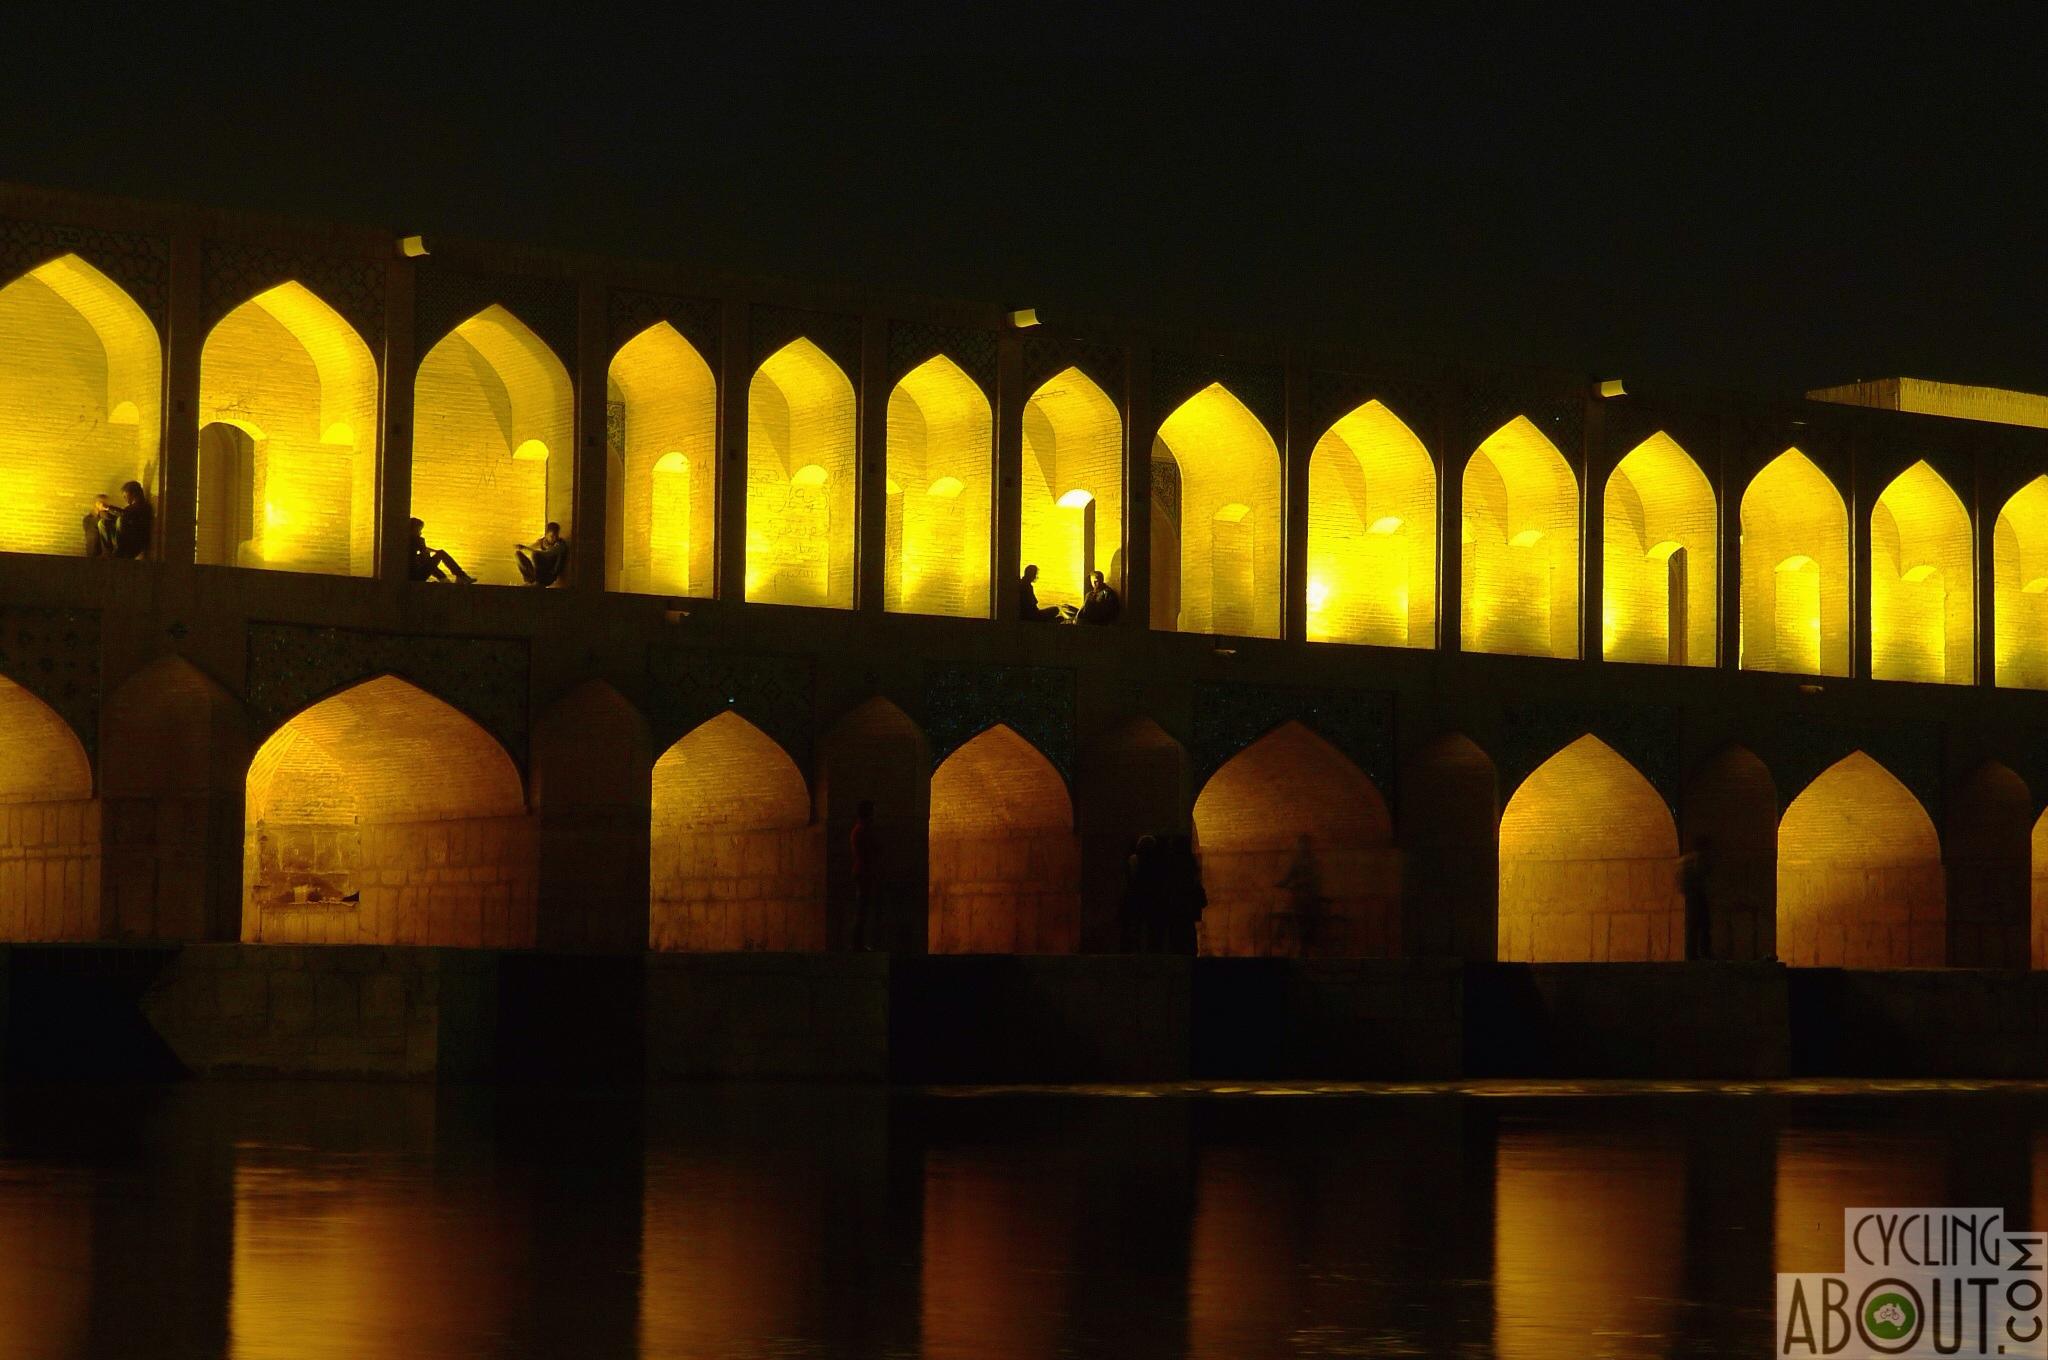 Alleykat_night in Iran